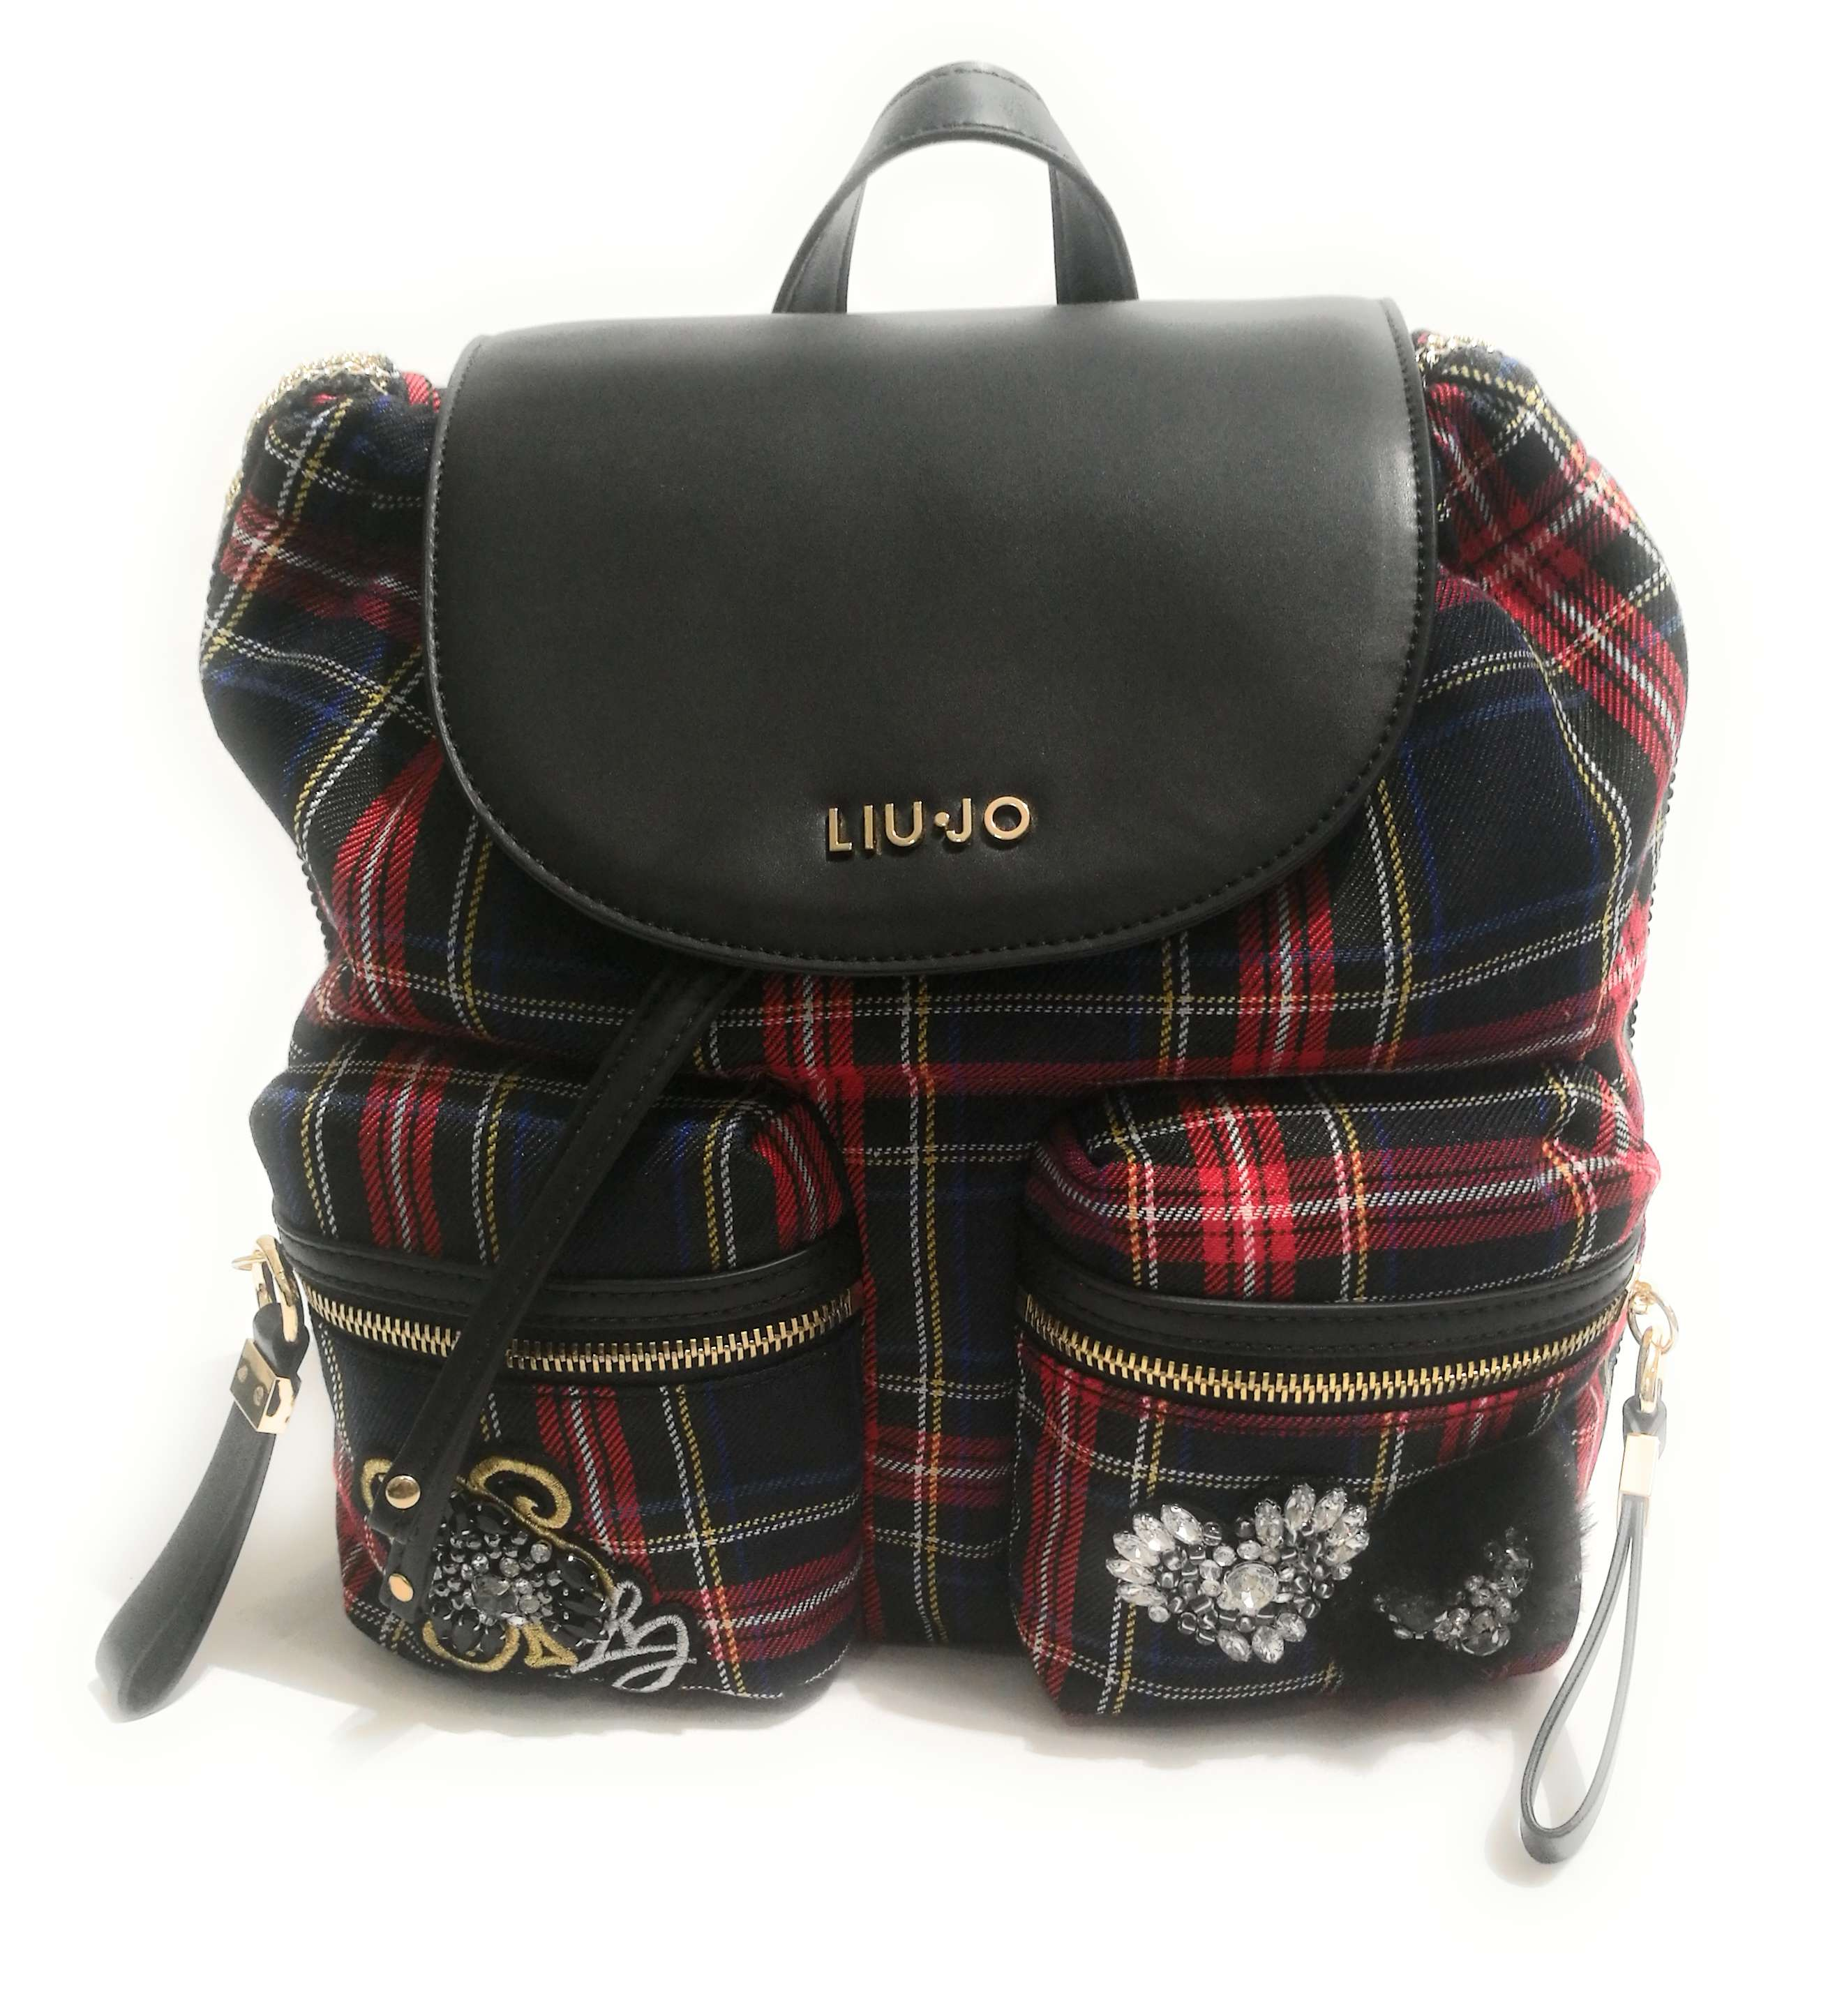 ZAINO LIU-JO BRENTA Checkered Tartan Backpack Medium Donna B19Lj54 ... 4116b1104de